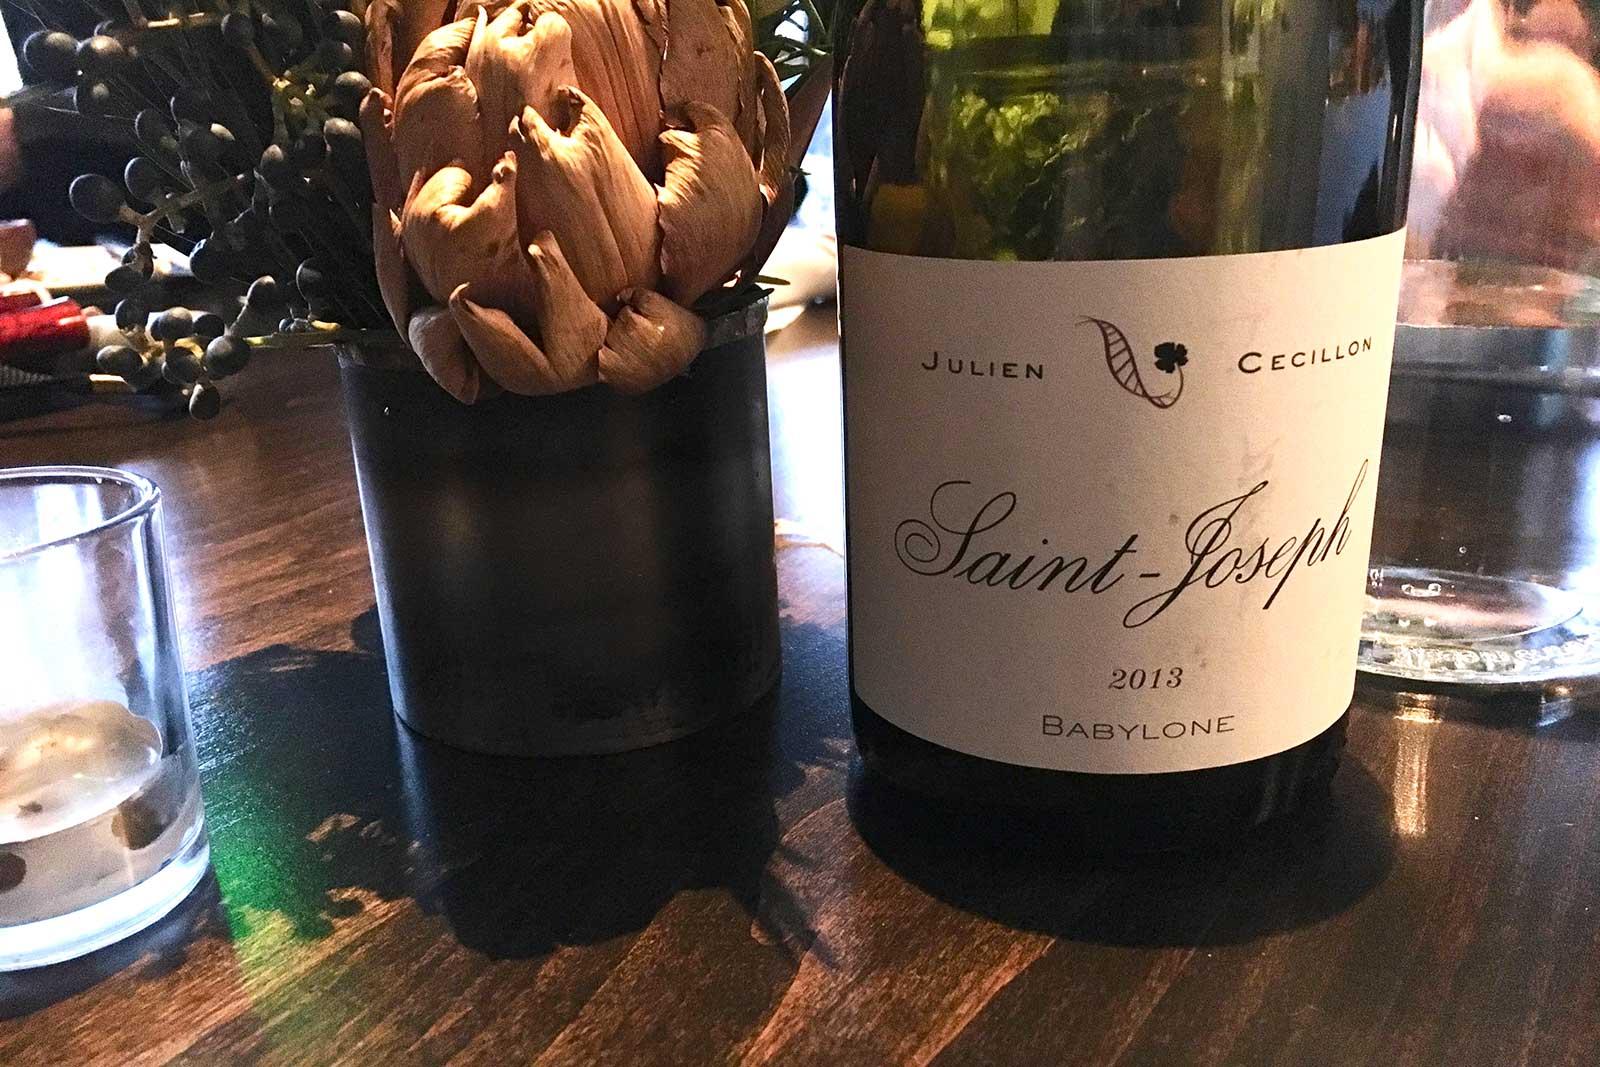 2013 Julien Cecillon Saint-Joseph ©Kevin Day/Opening a Bottle